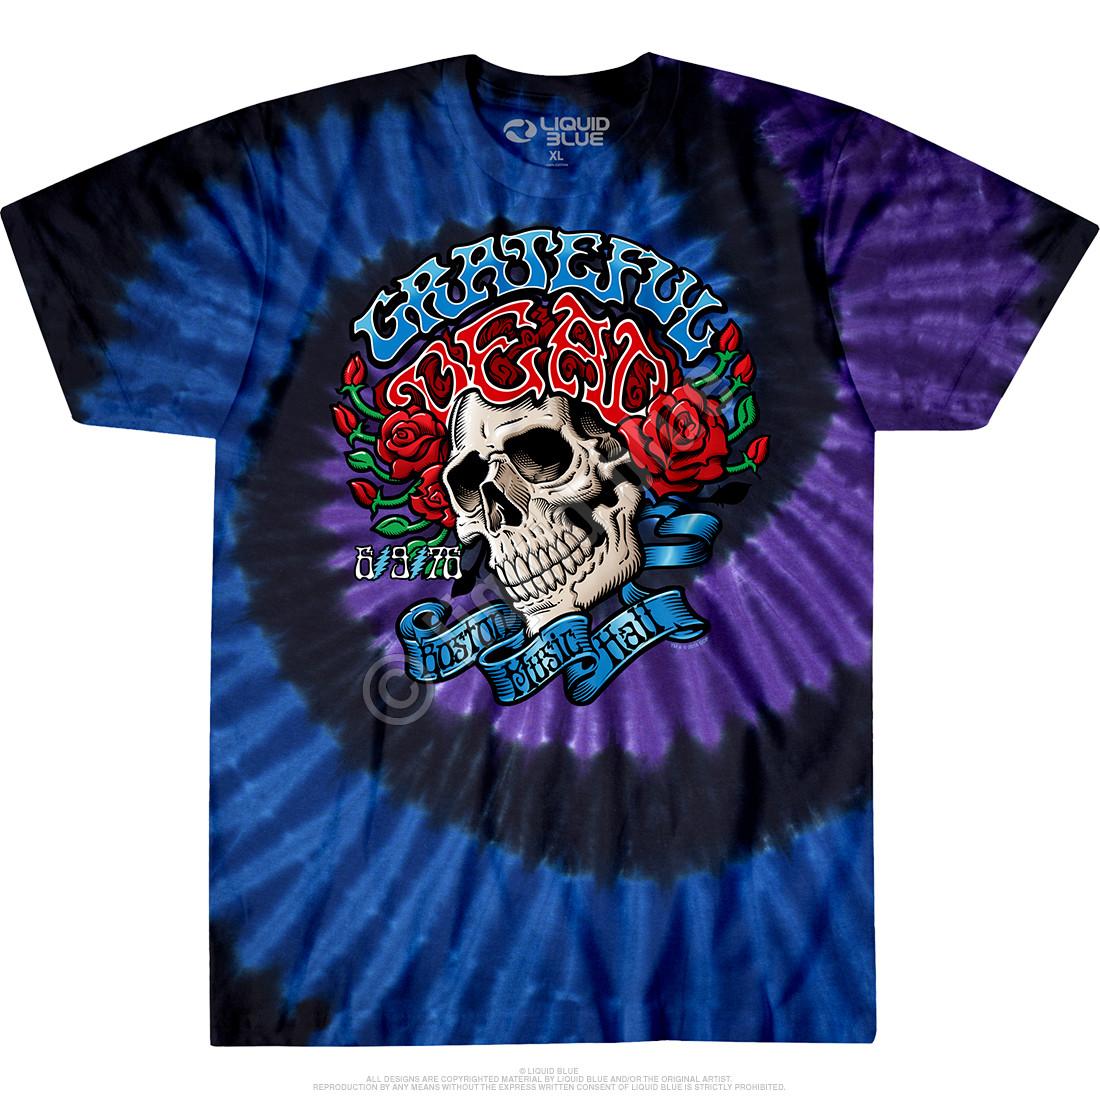 Boston Music Hall Tie-Dye T-Shirt